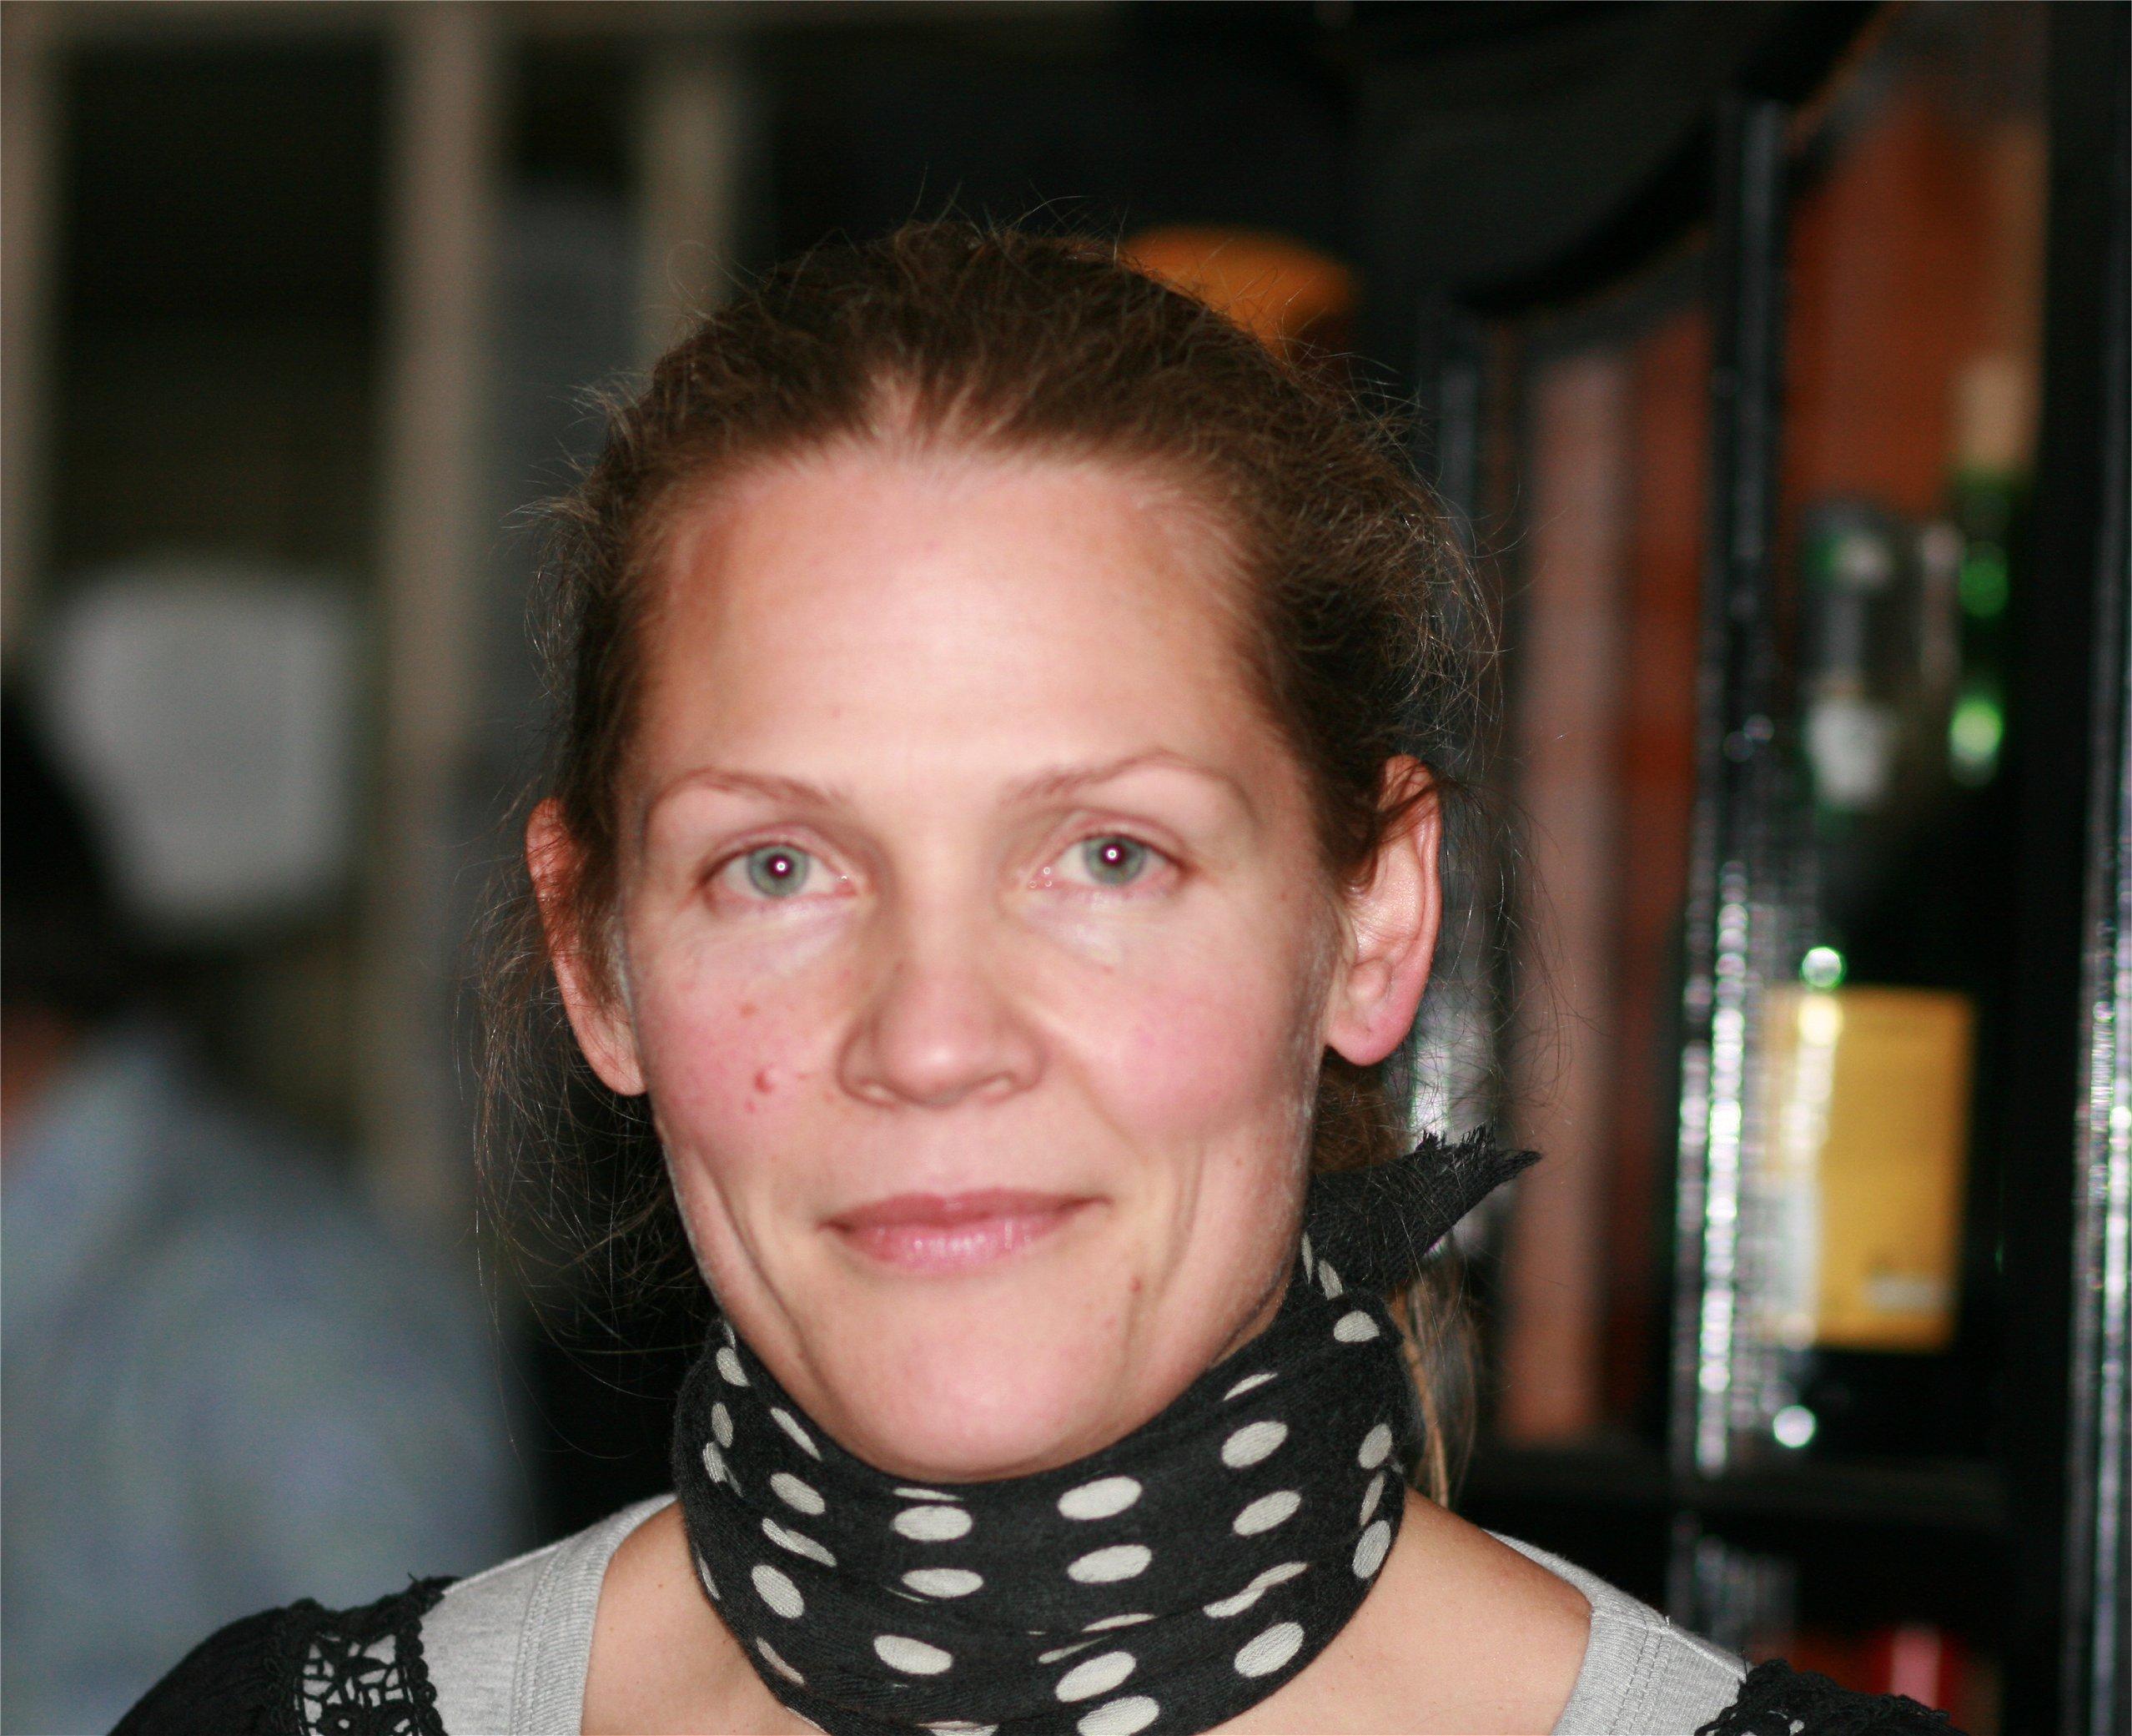 Åsne Seierstad in 2007